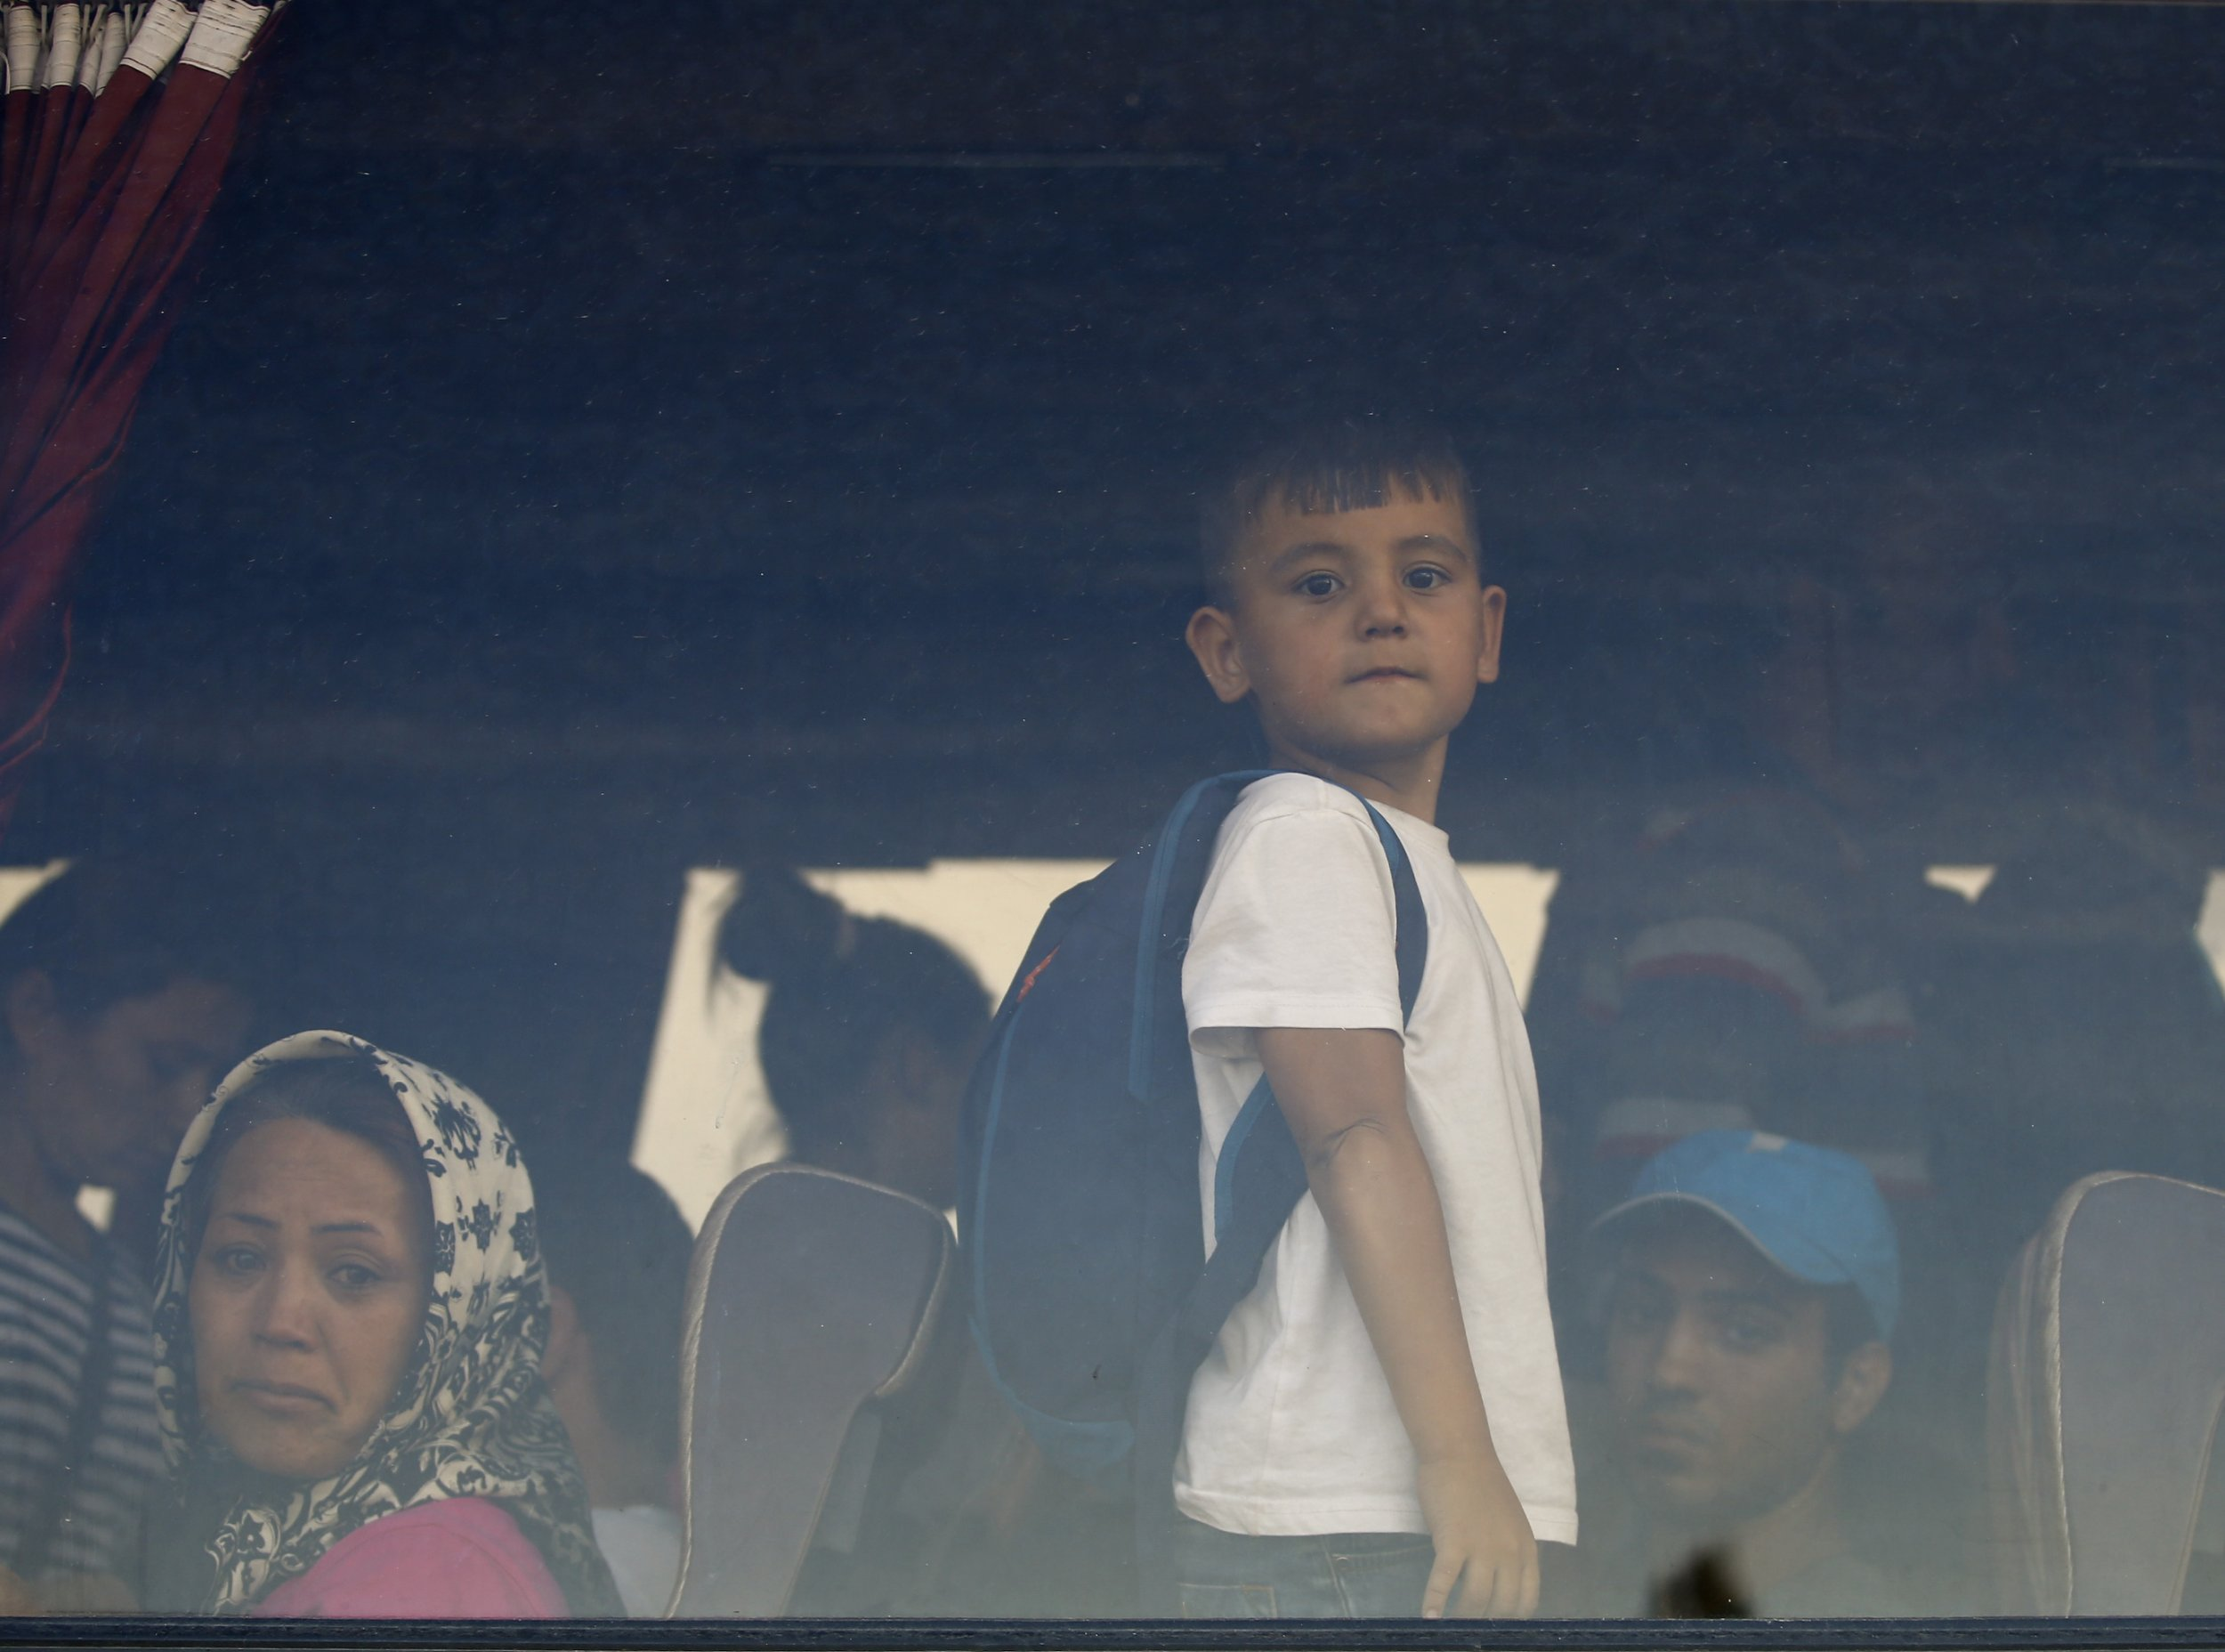 9/4 Hungary Refugees Train Camp